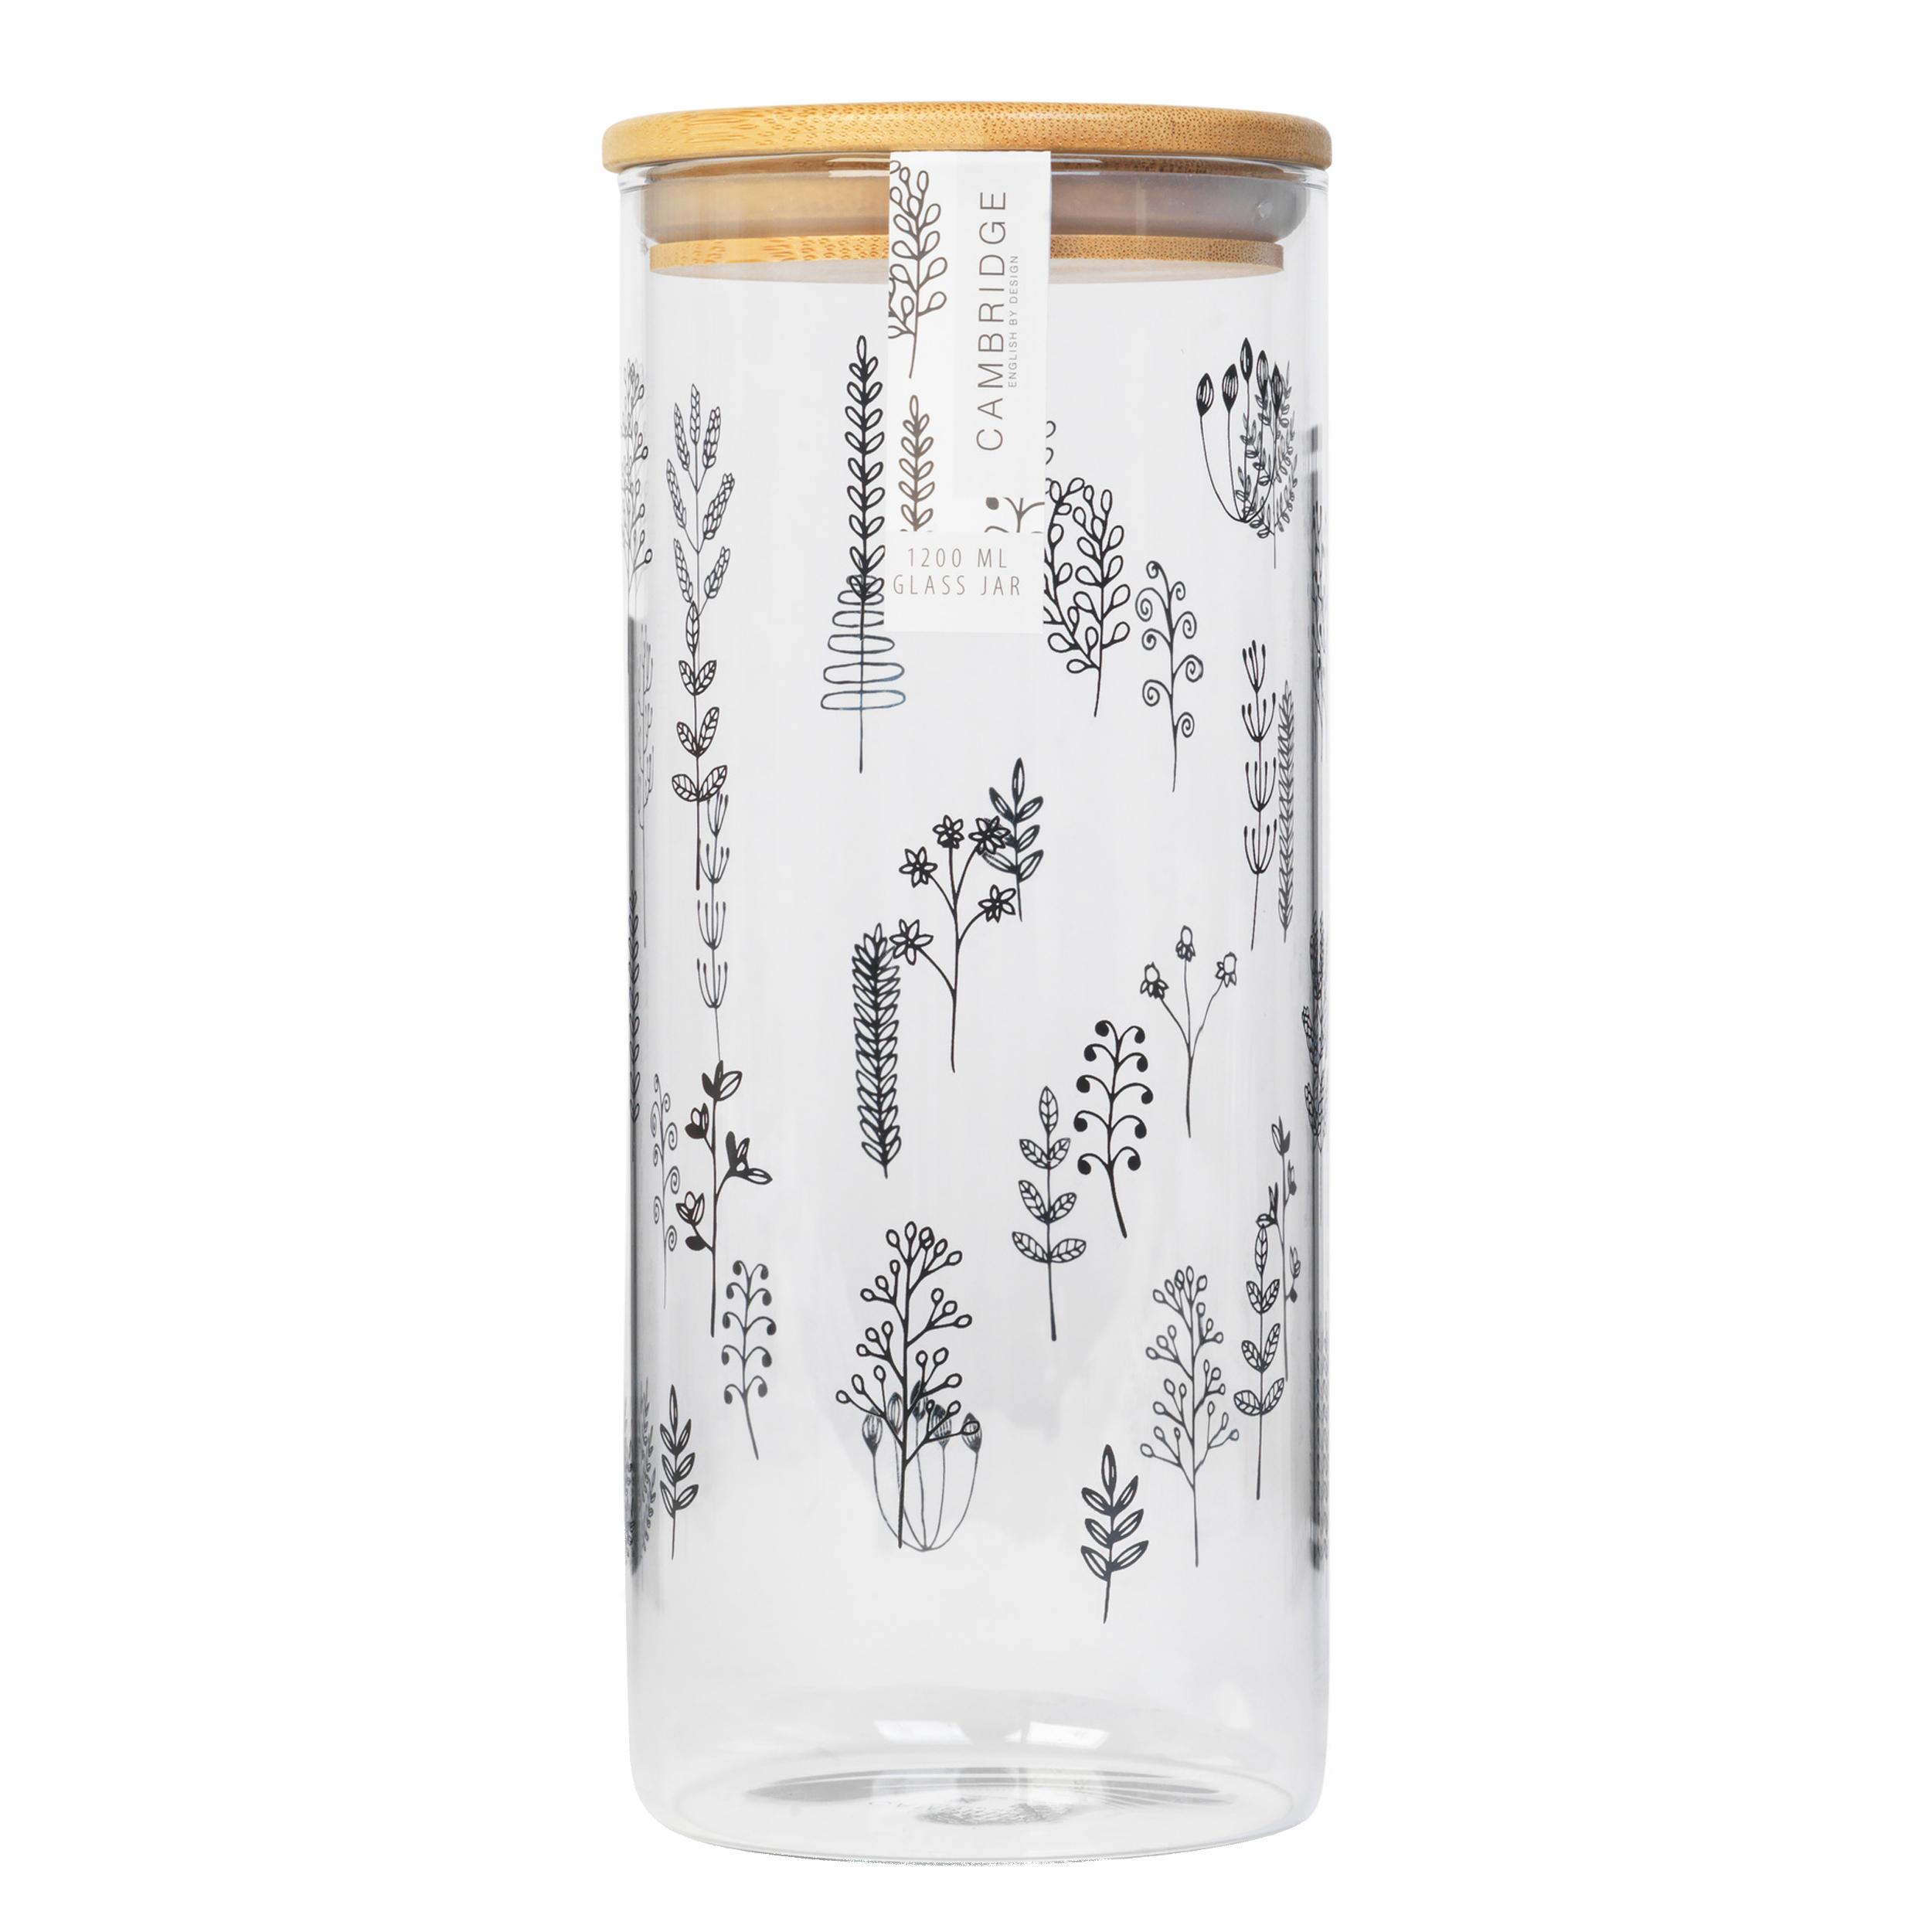 thumbnail 11 - Cambridge® Storage Preserving Glass Jar, 1200 ml, Spring Meadow/Doodle/Arielle